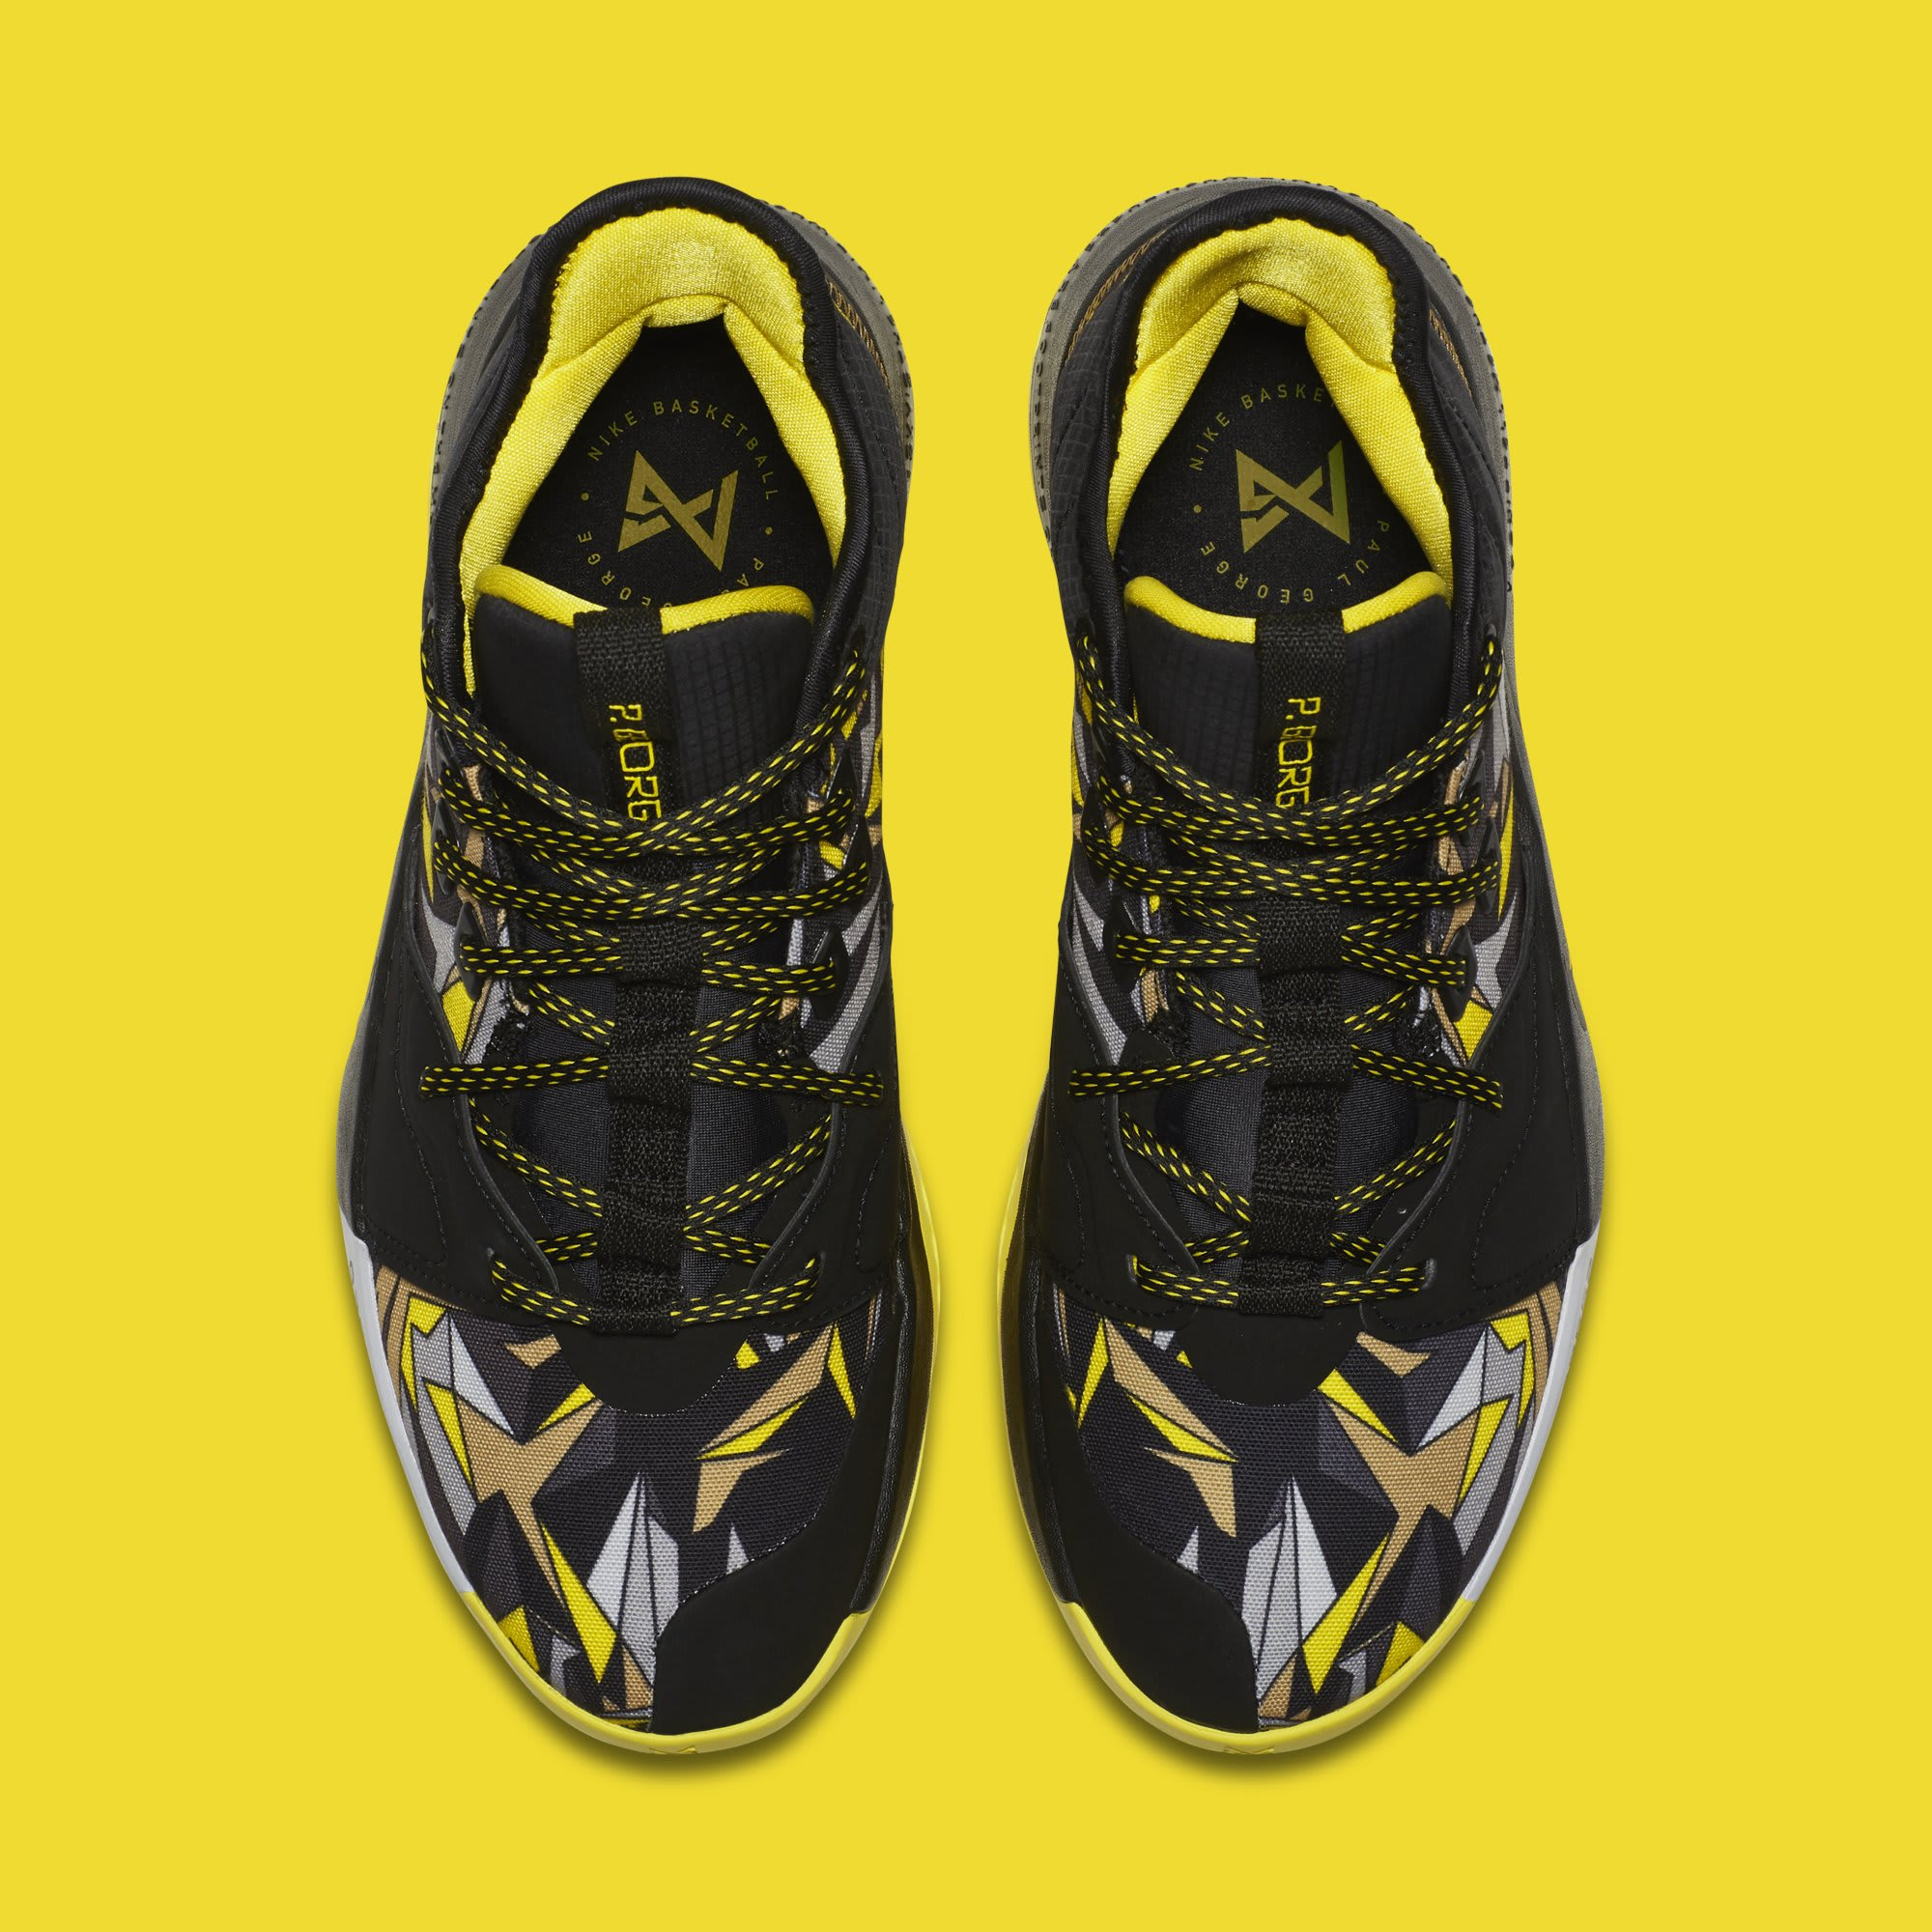 release date e7cc2 dde47 Nike PG 3 'Mamba Mentality' Multi-Color/Opti Yellow AO2607 ...